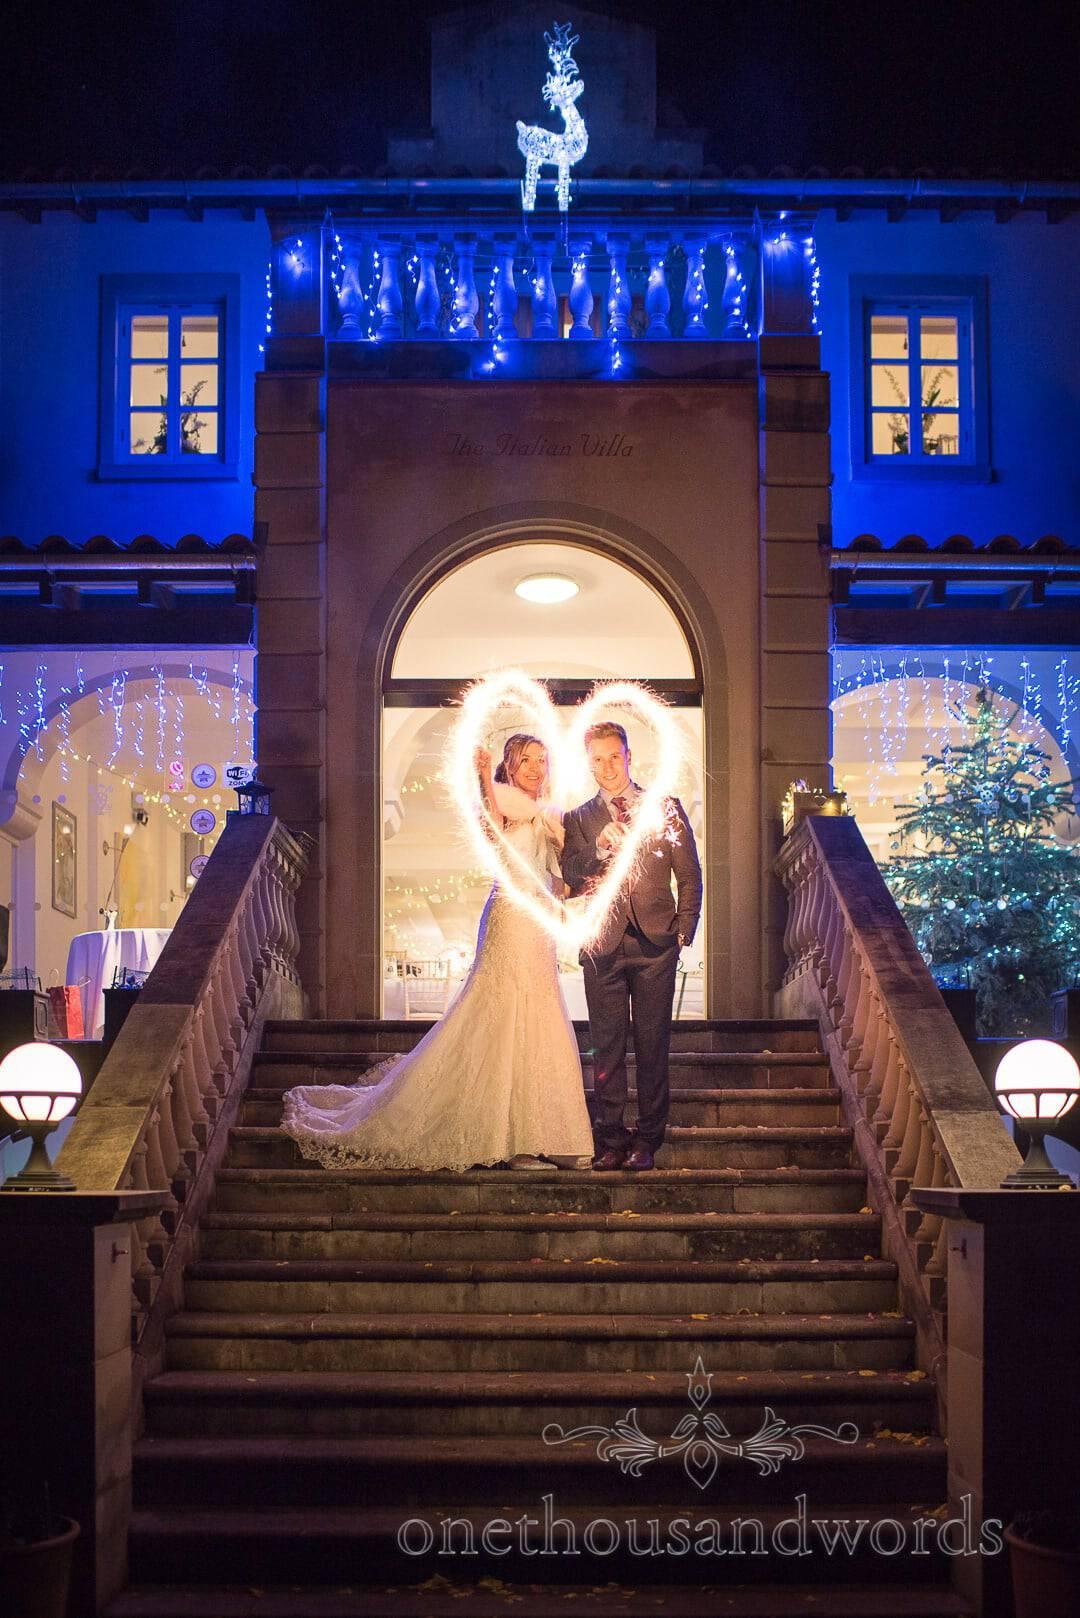 Christmas Love heart Sparklers at The Italian Villa wedding venue photographs